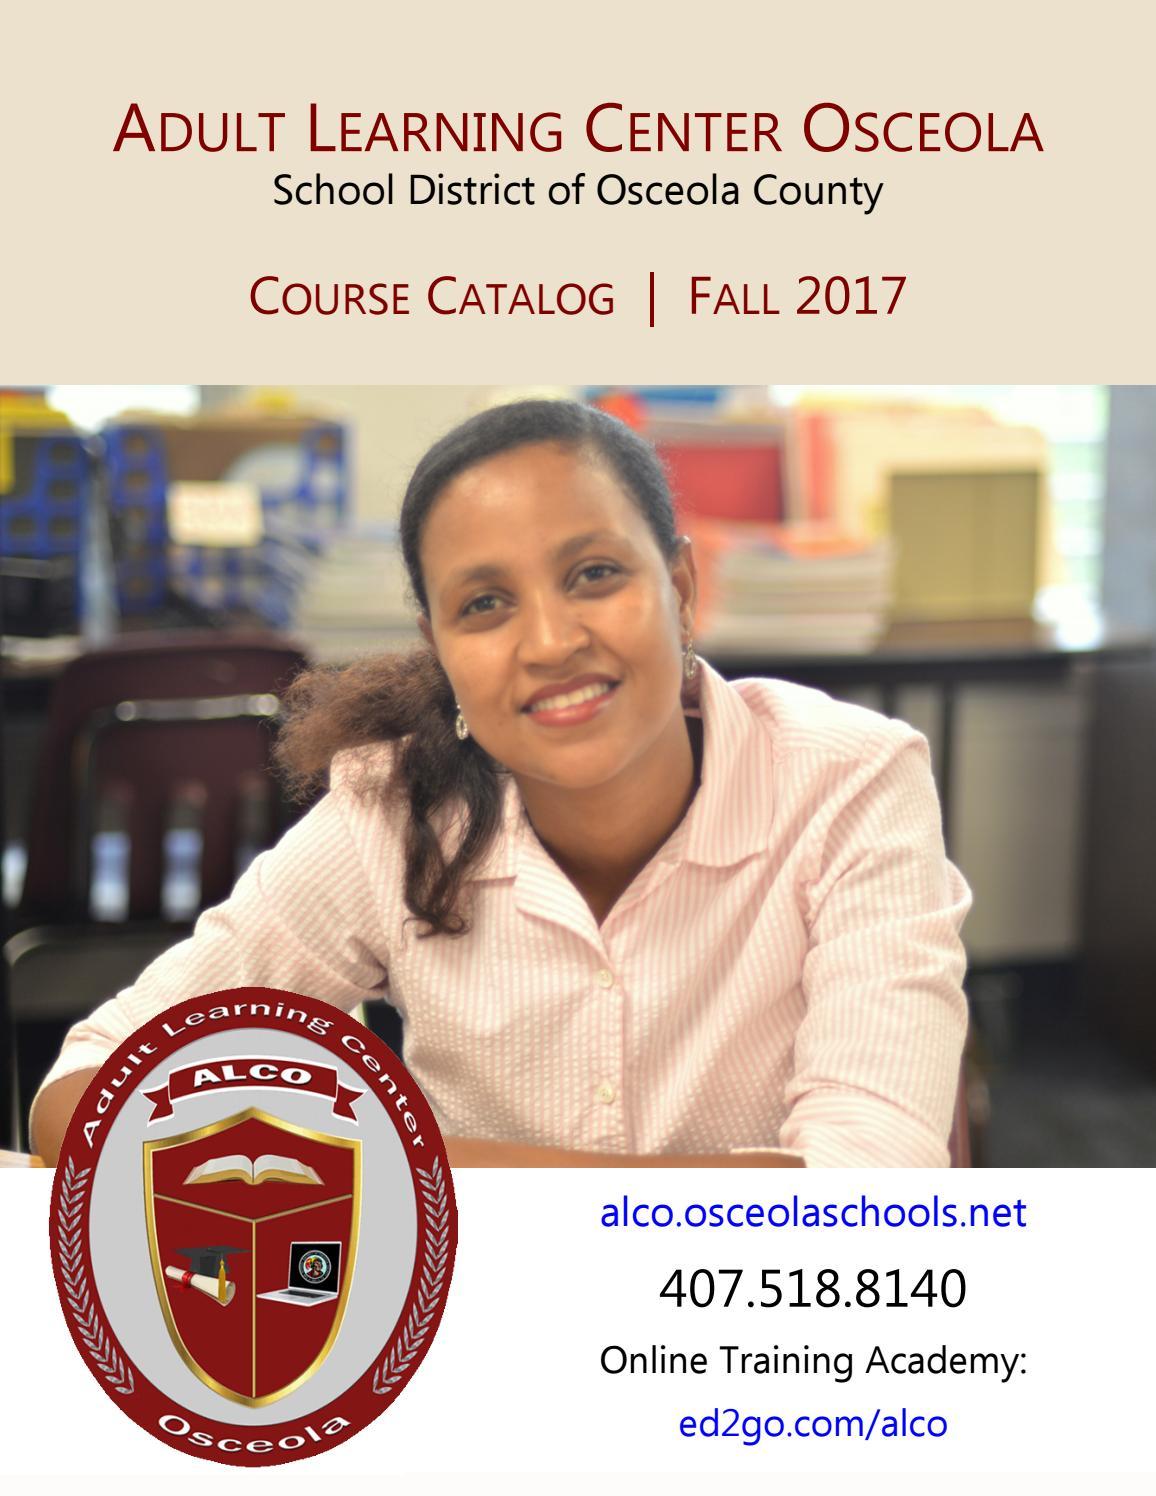 Adult Learning Center Osceola 76